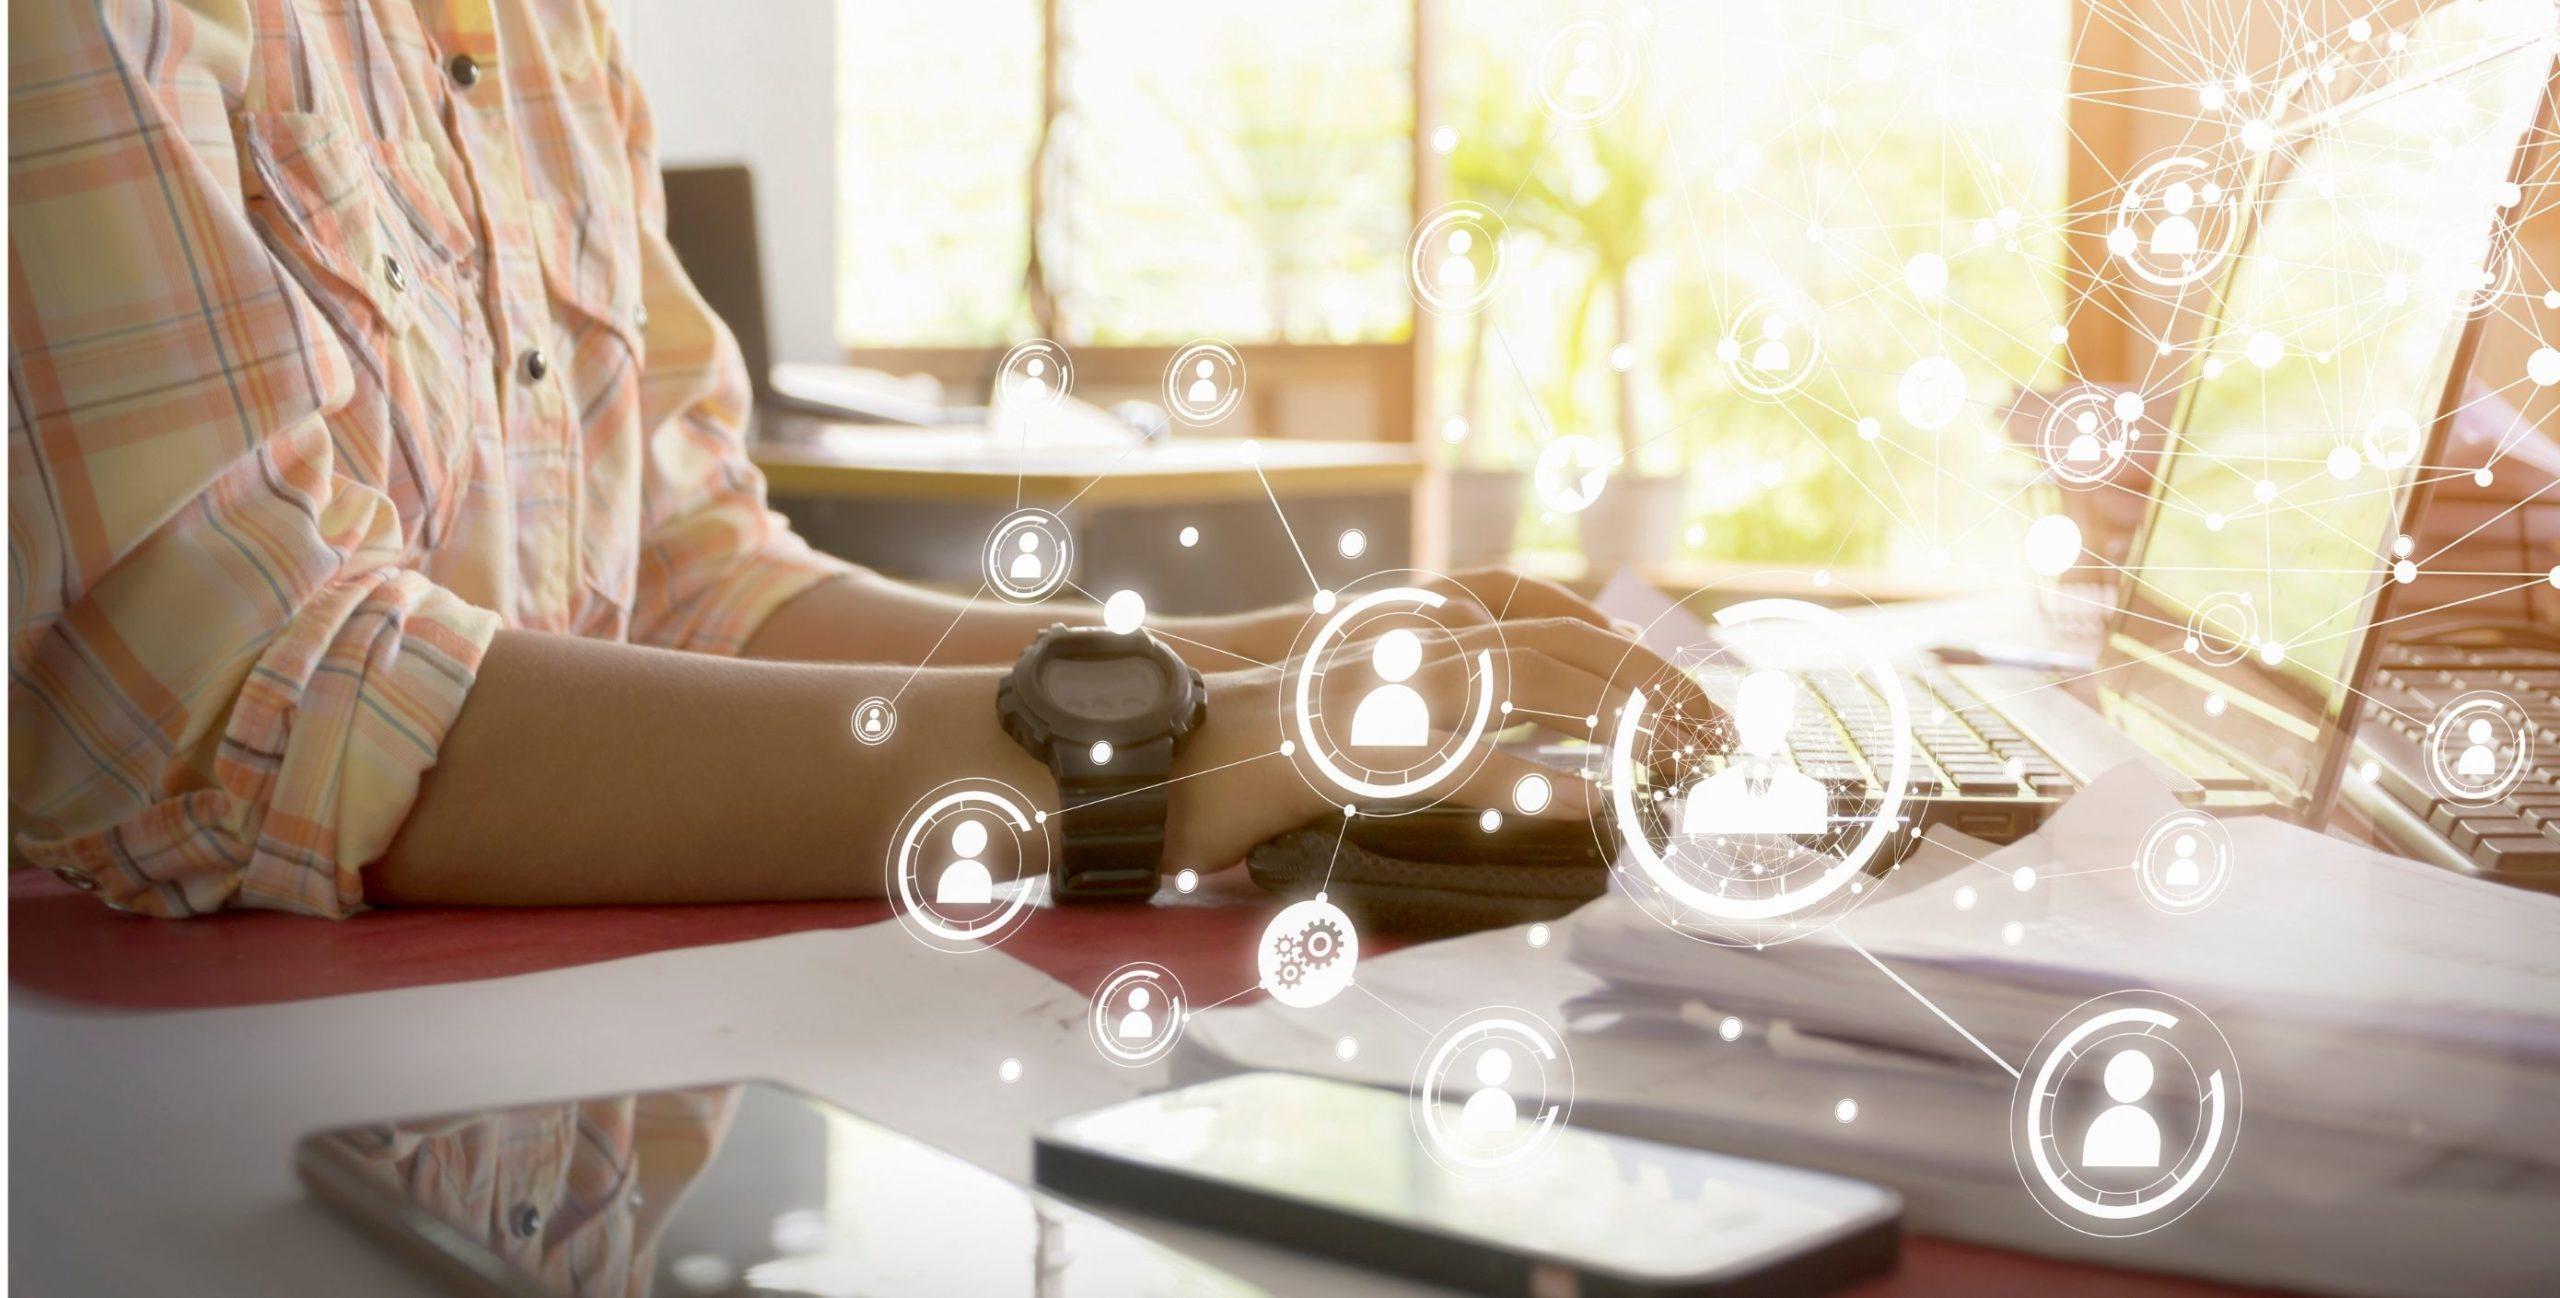 digital marketing tools, marketing, bc & associates, small business marketing